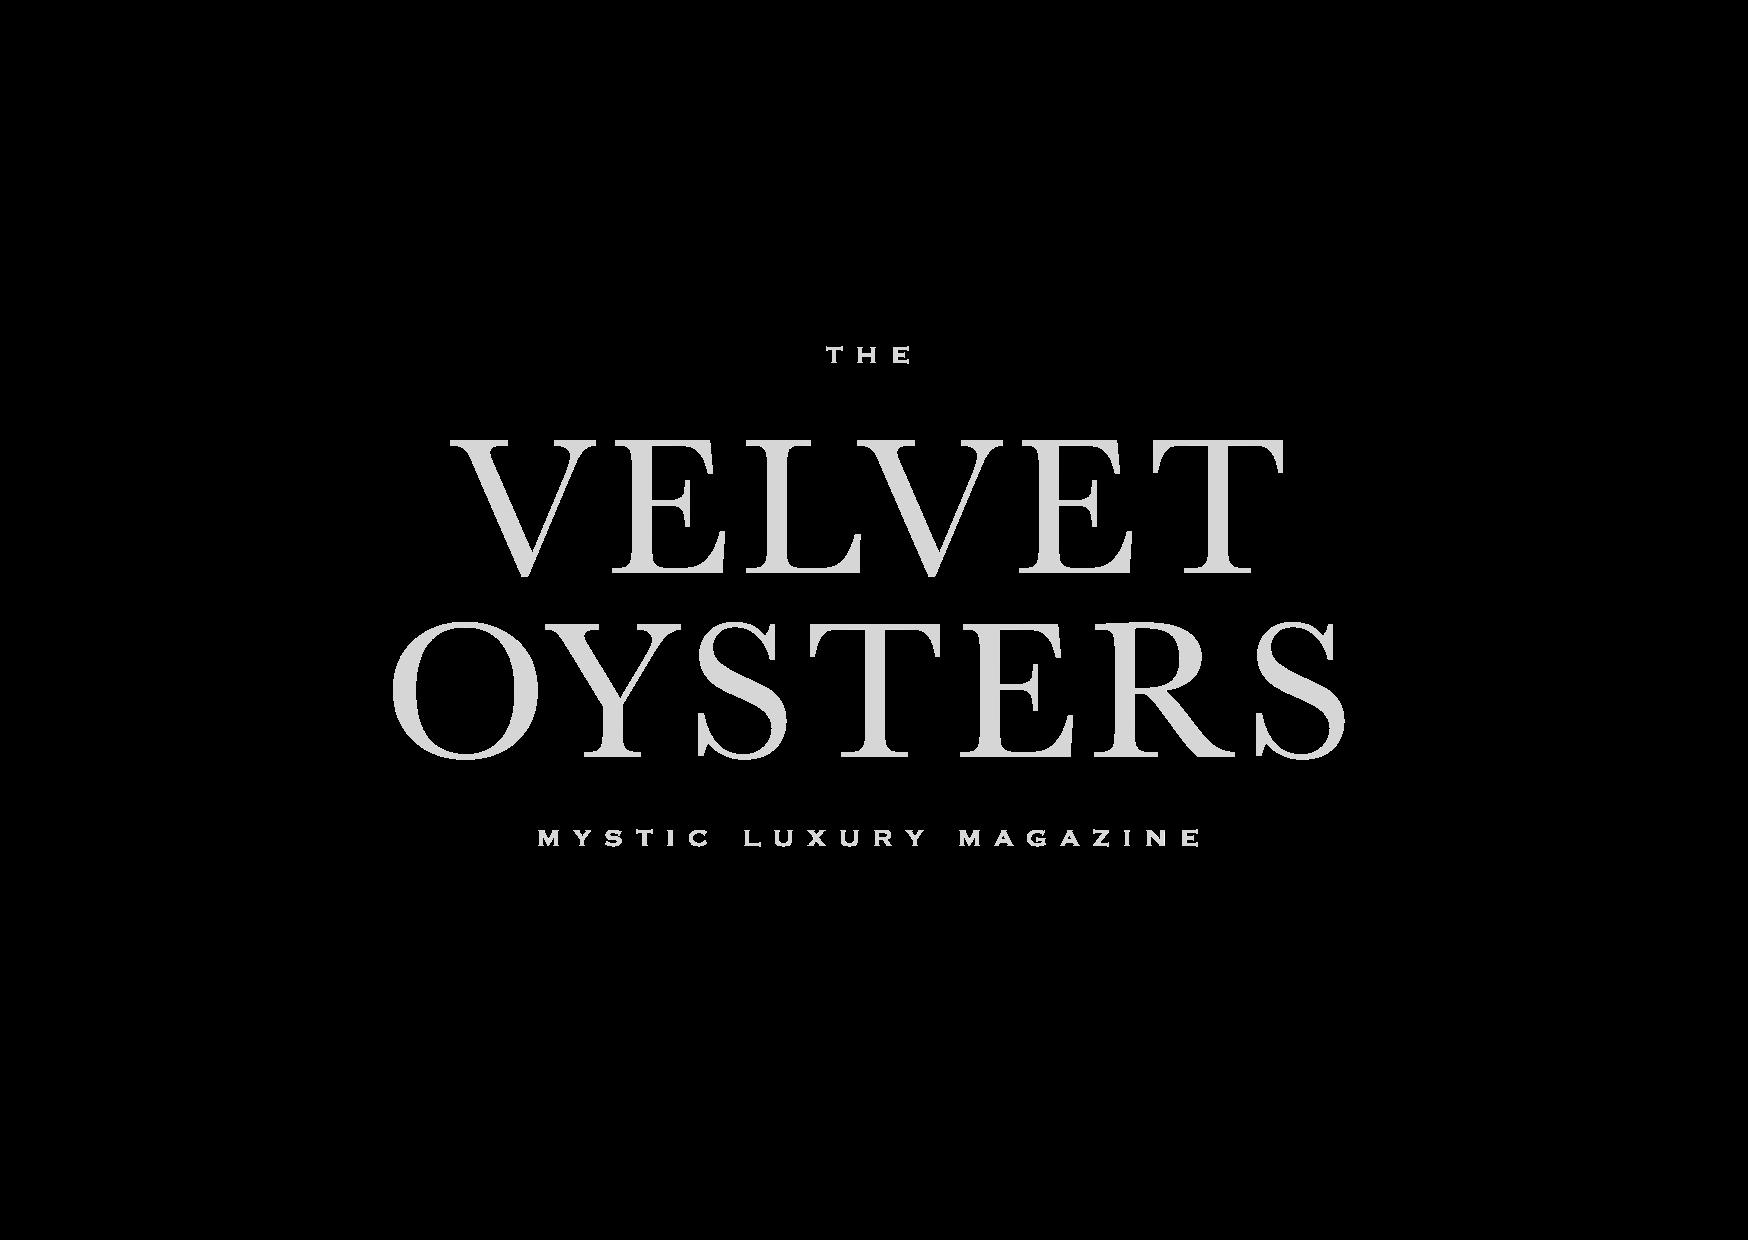 Velvet Oysters Mystic Luxury Magazine .png